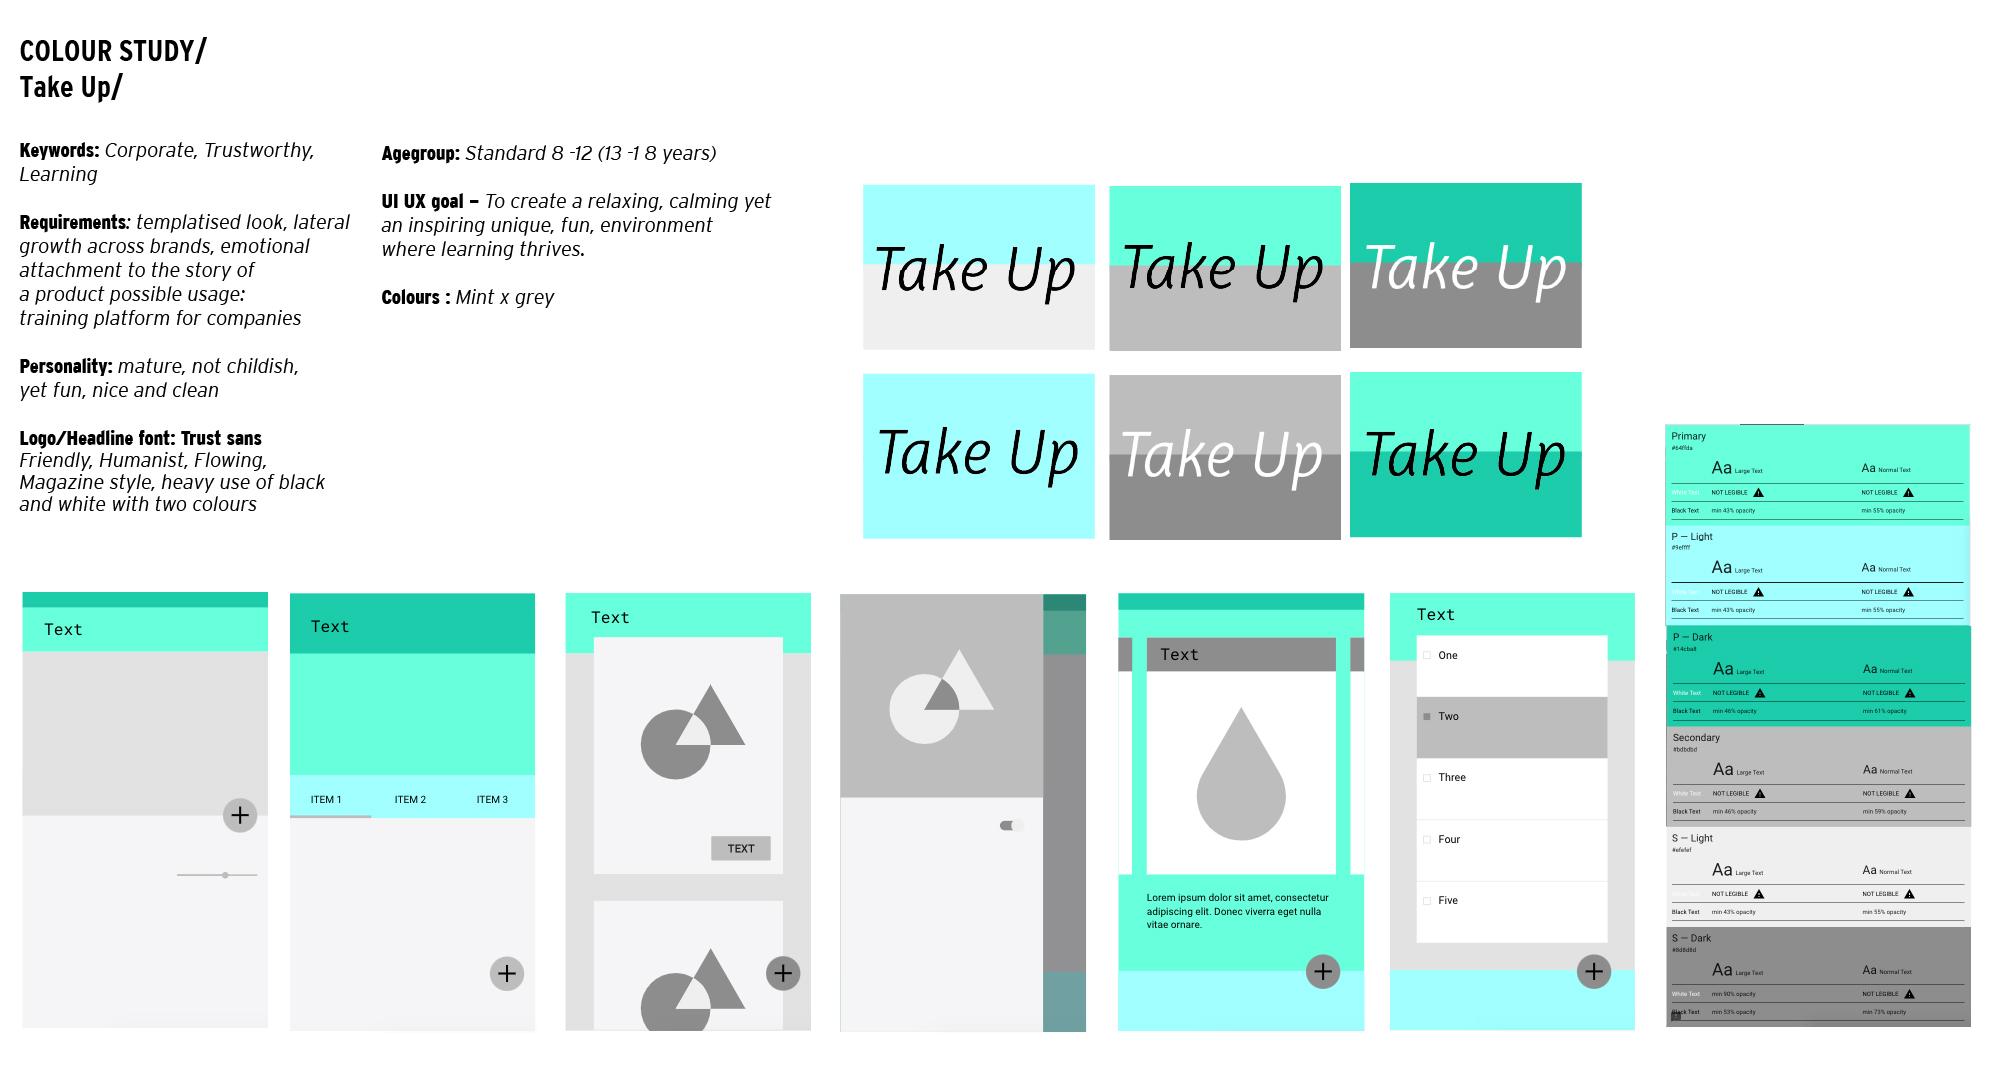 TakeUpArtboard 10 copy 7-100